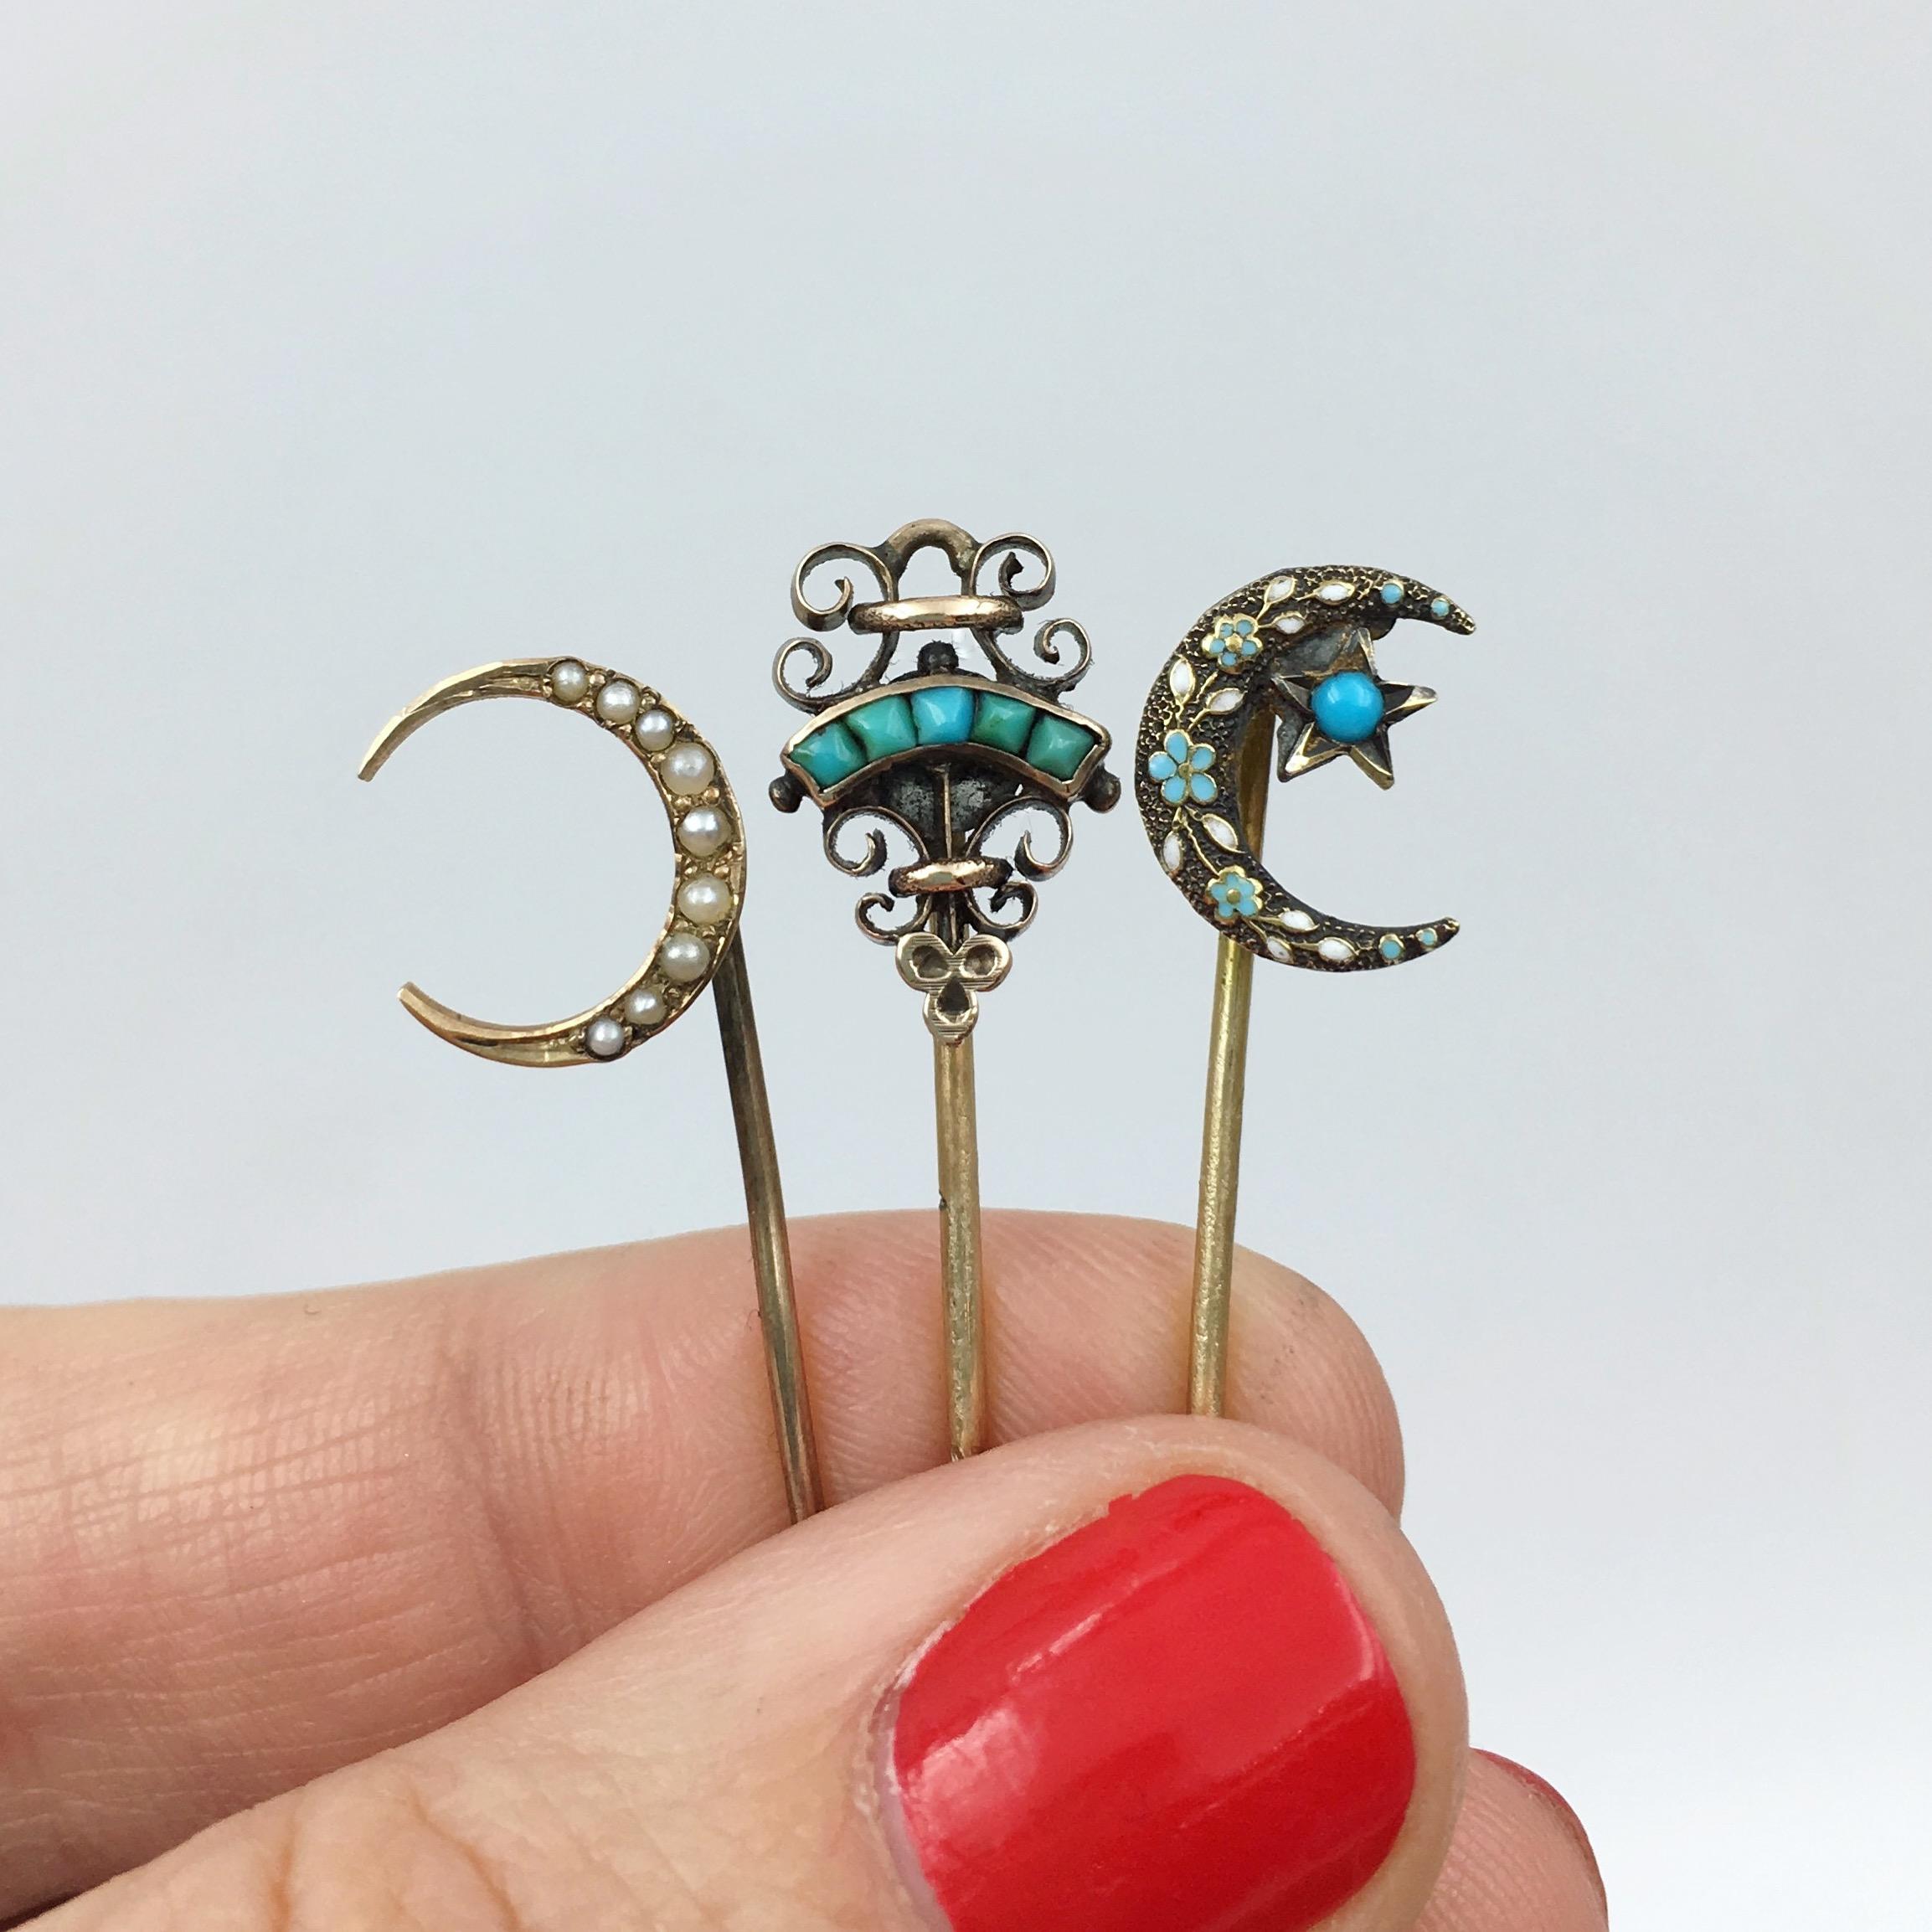 Best vintage jewelry NYC